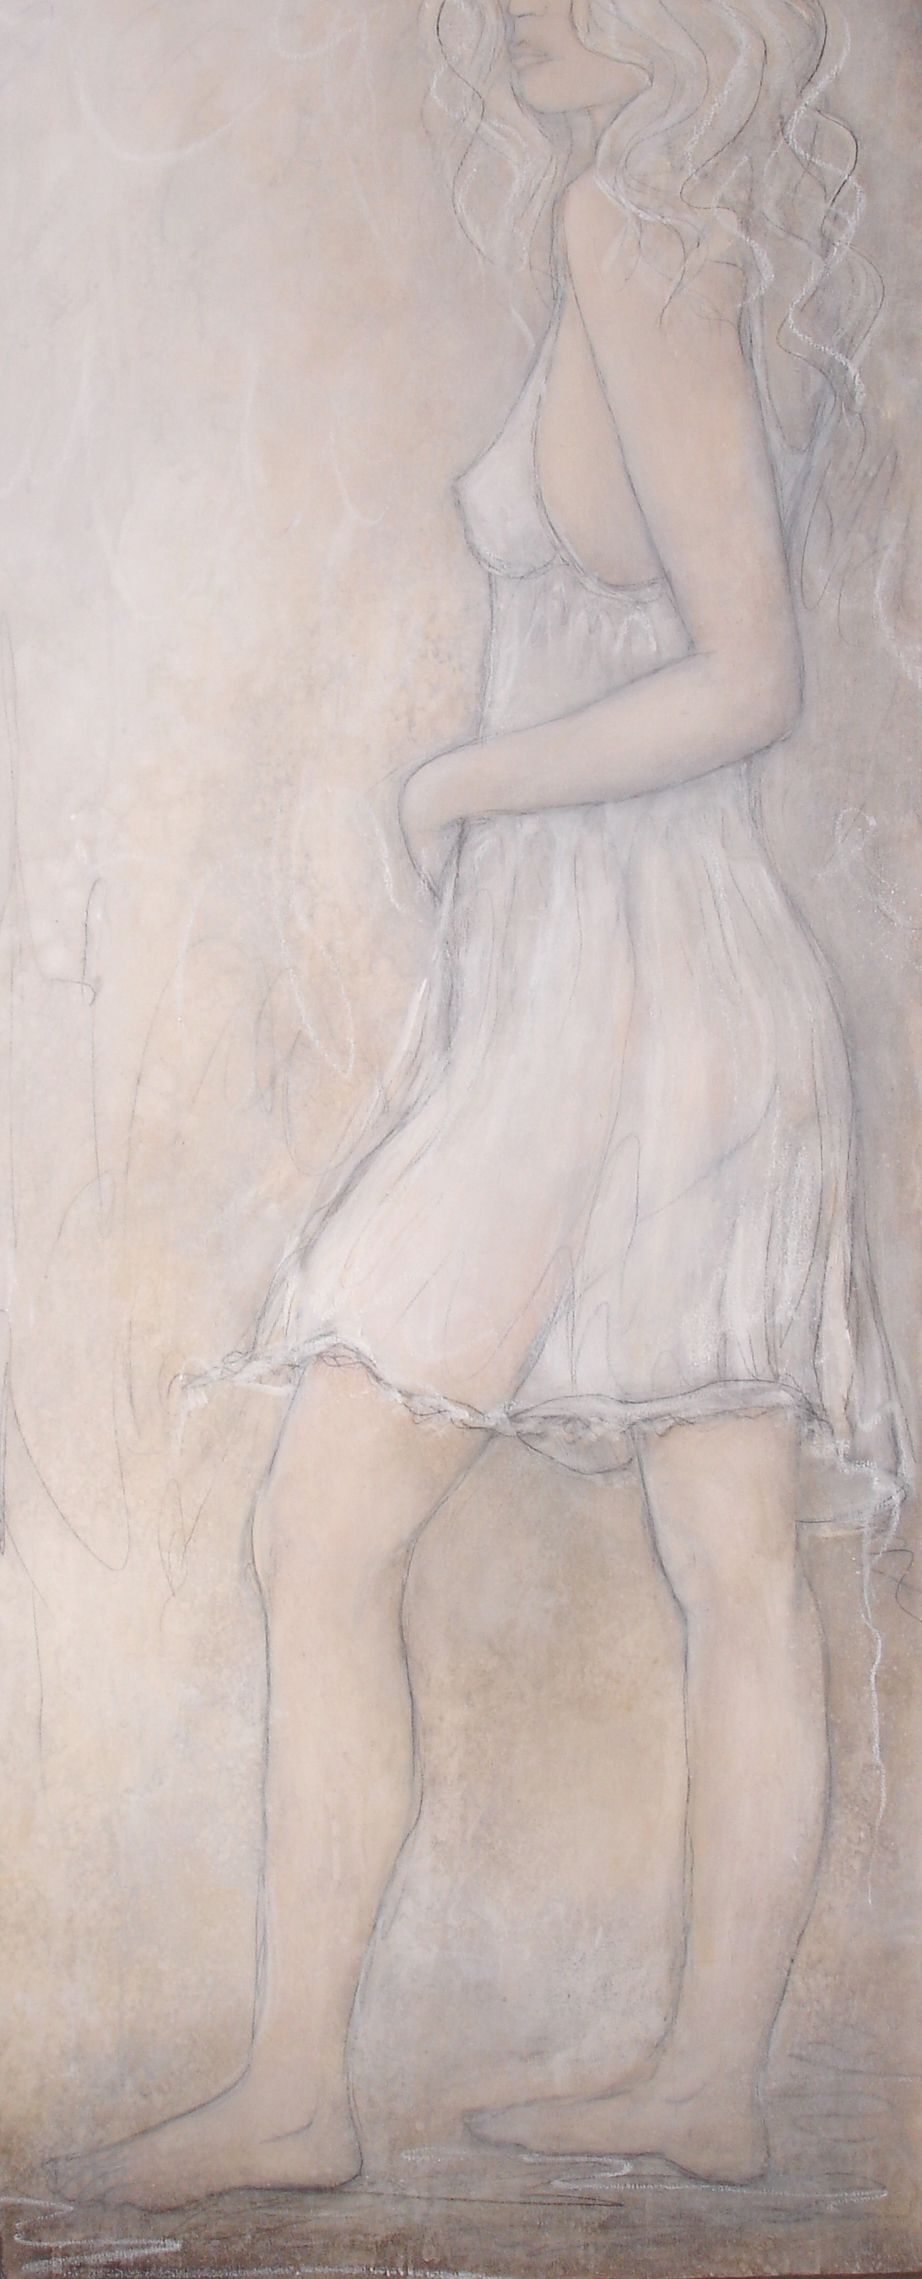 Moonlit,51 x 122cm